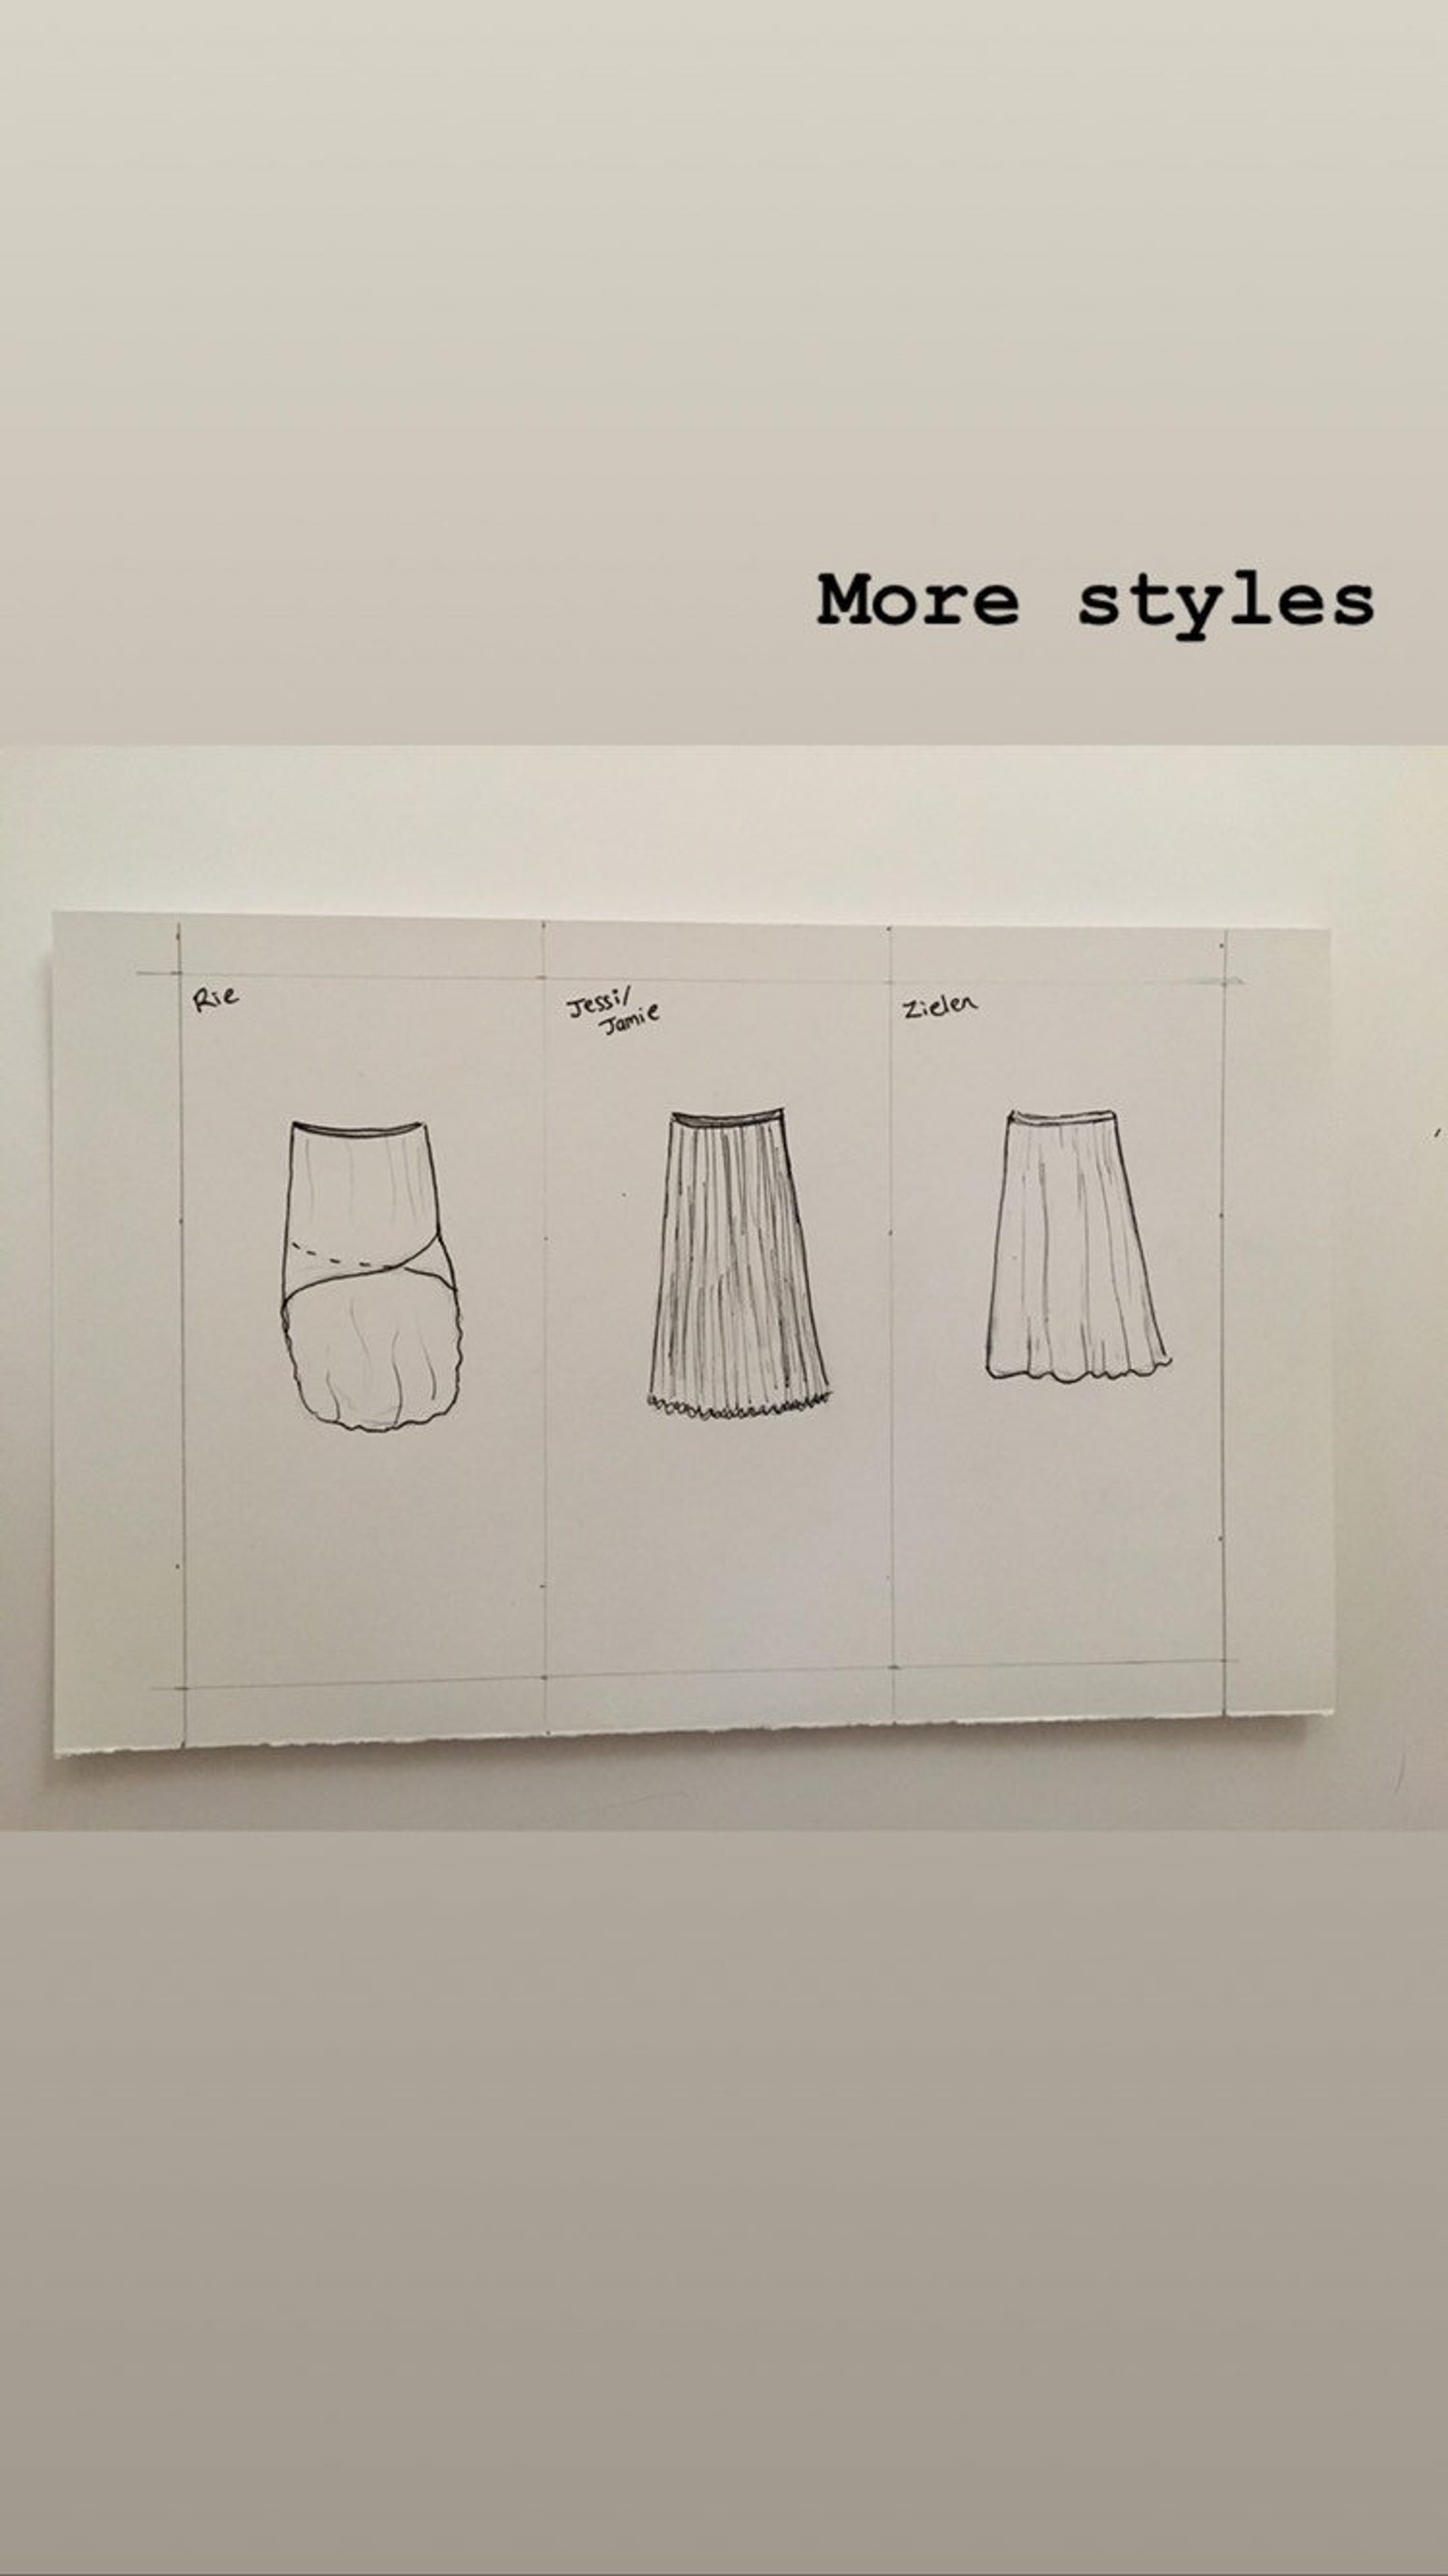 toi toi toi ballet wrap skirt long style! rehearsal, class, performance. molly style.